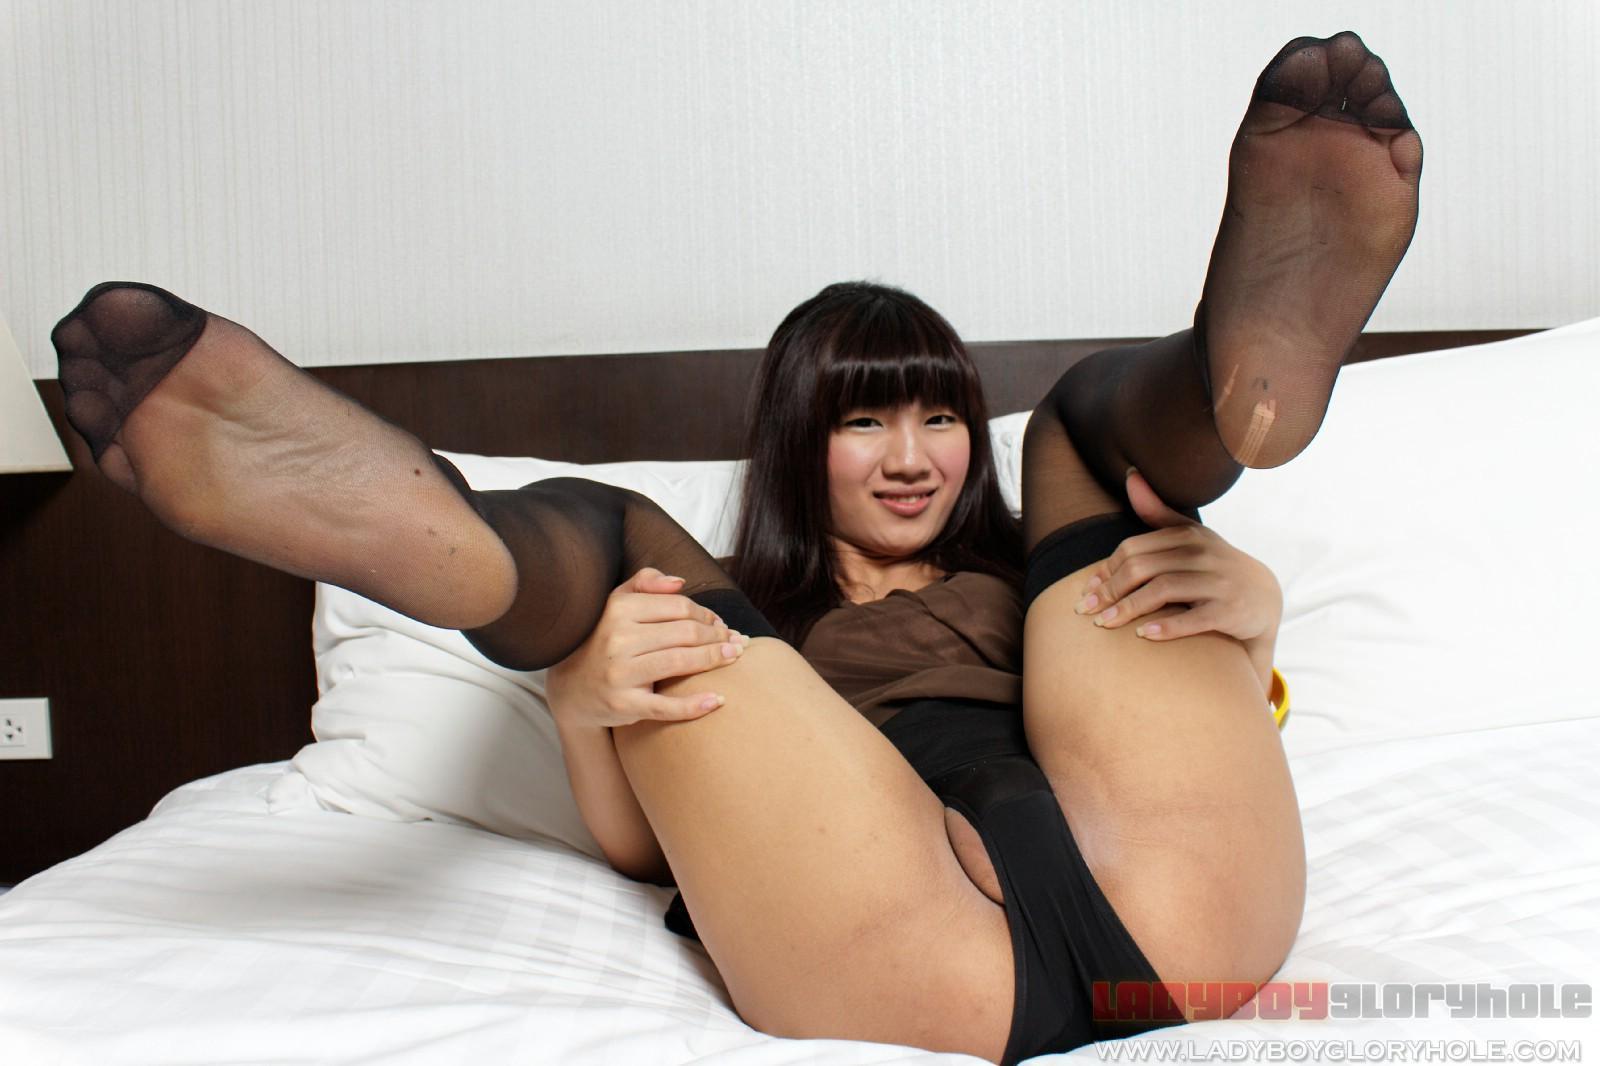 Ladyboy nylons free porn